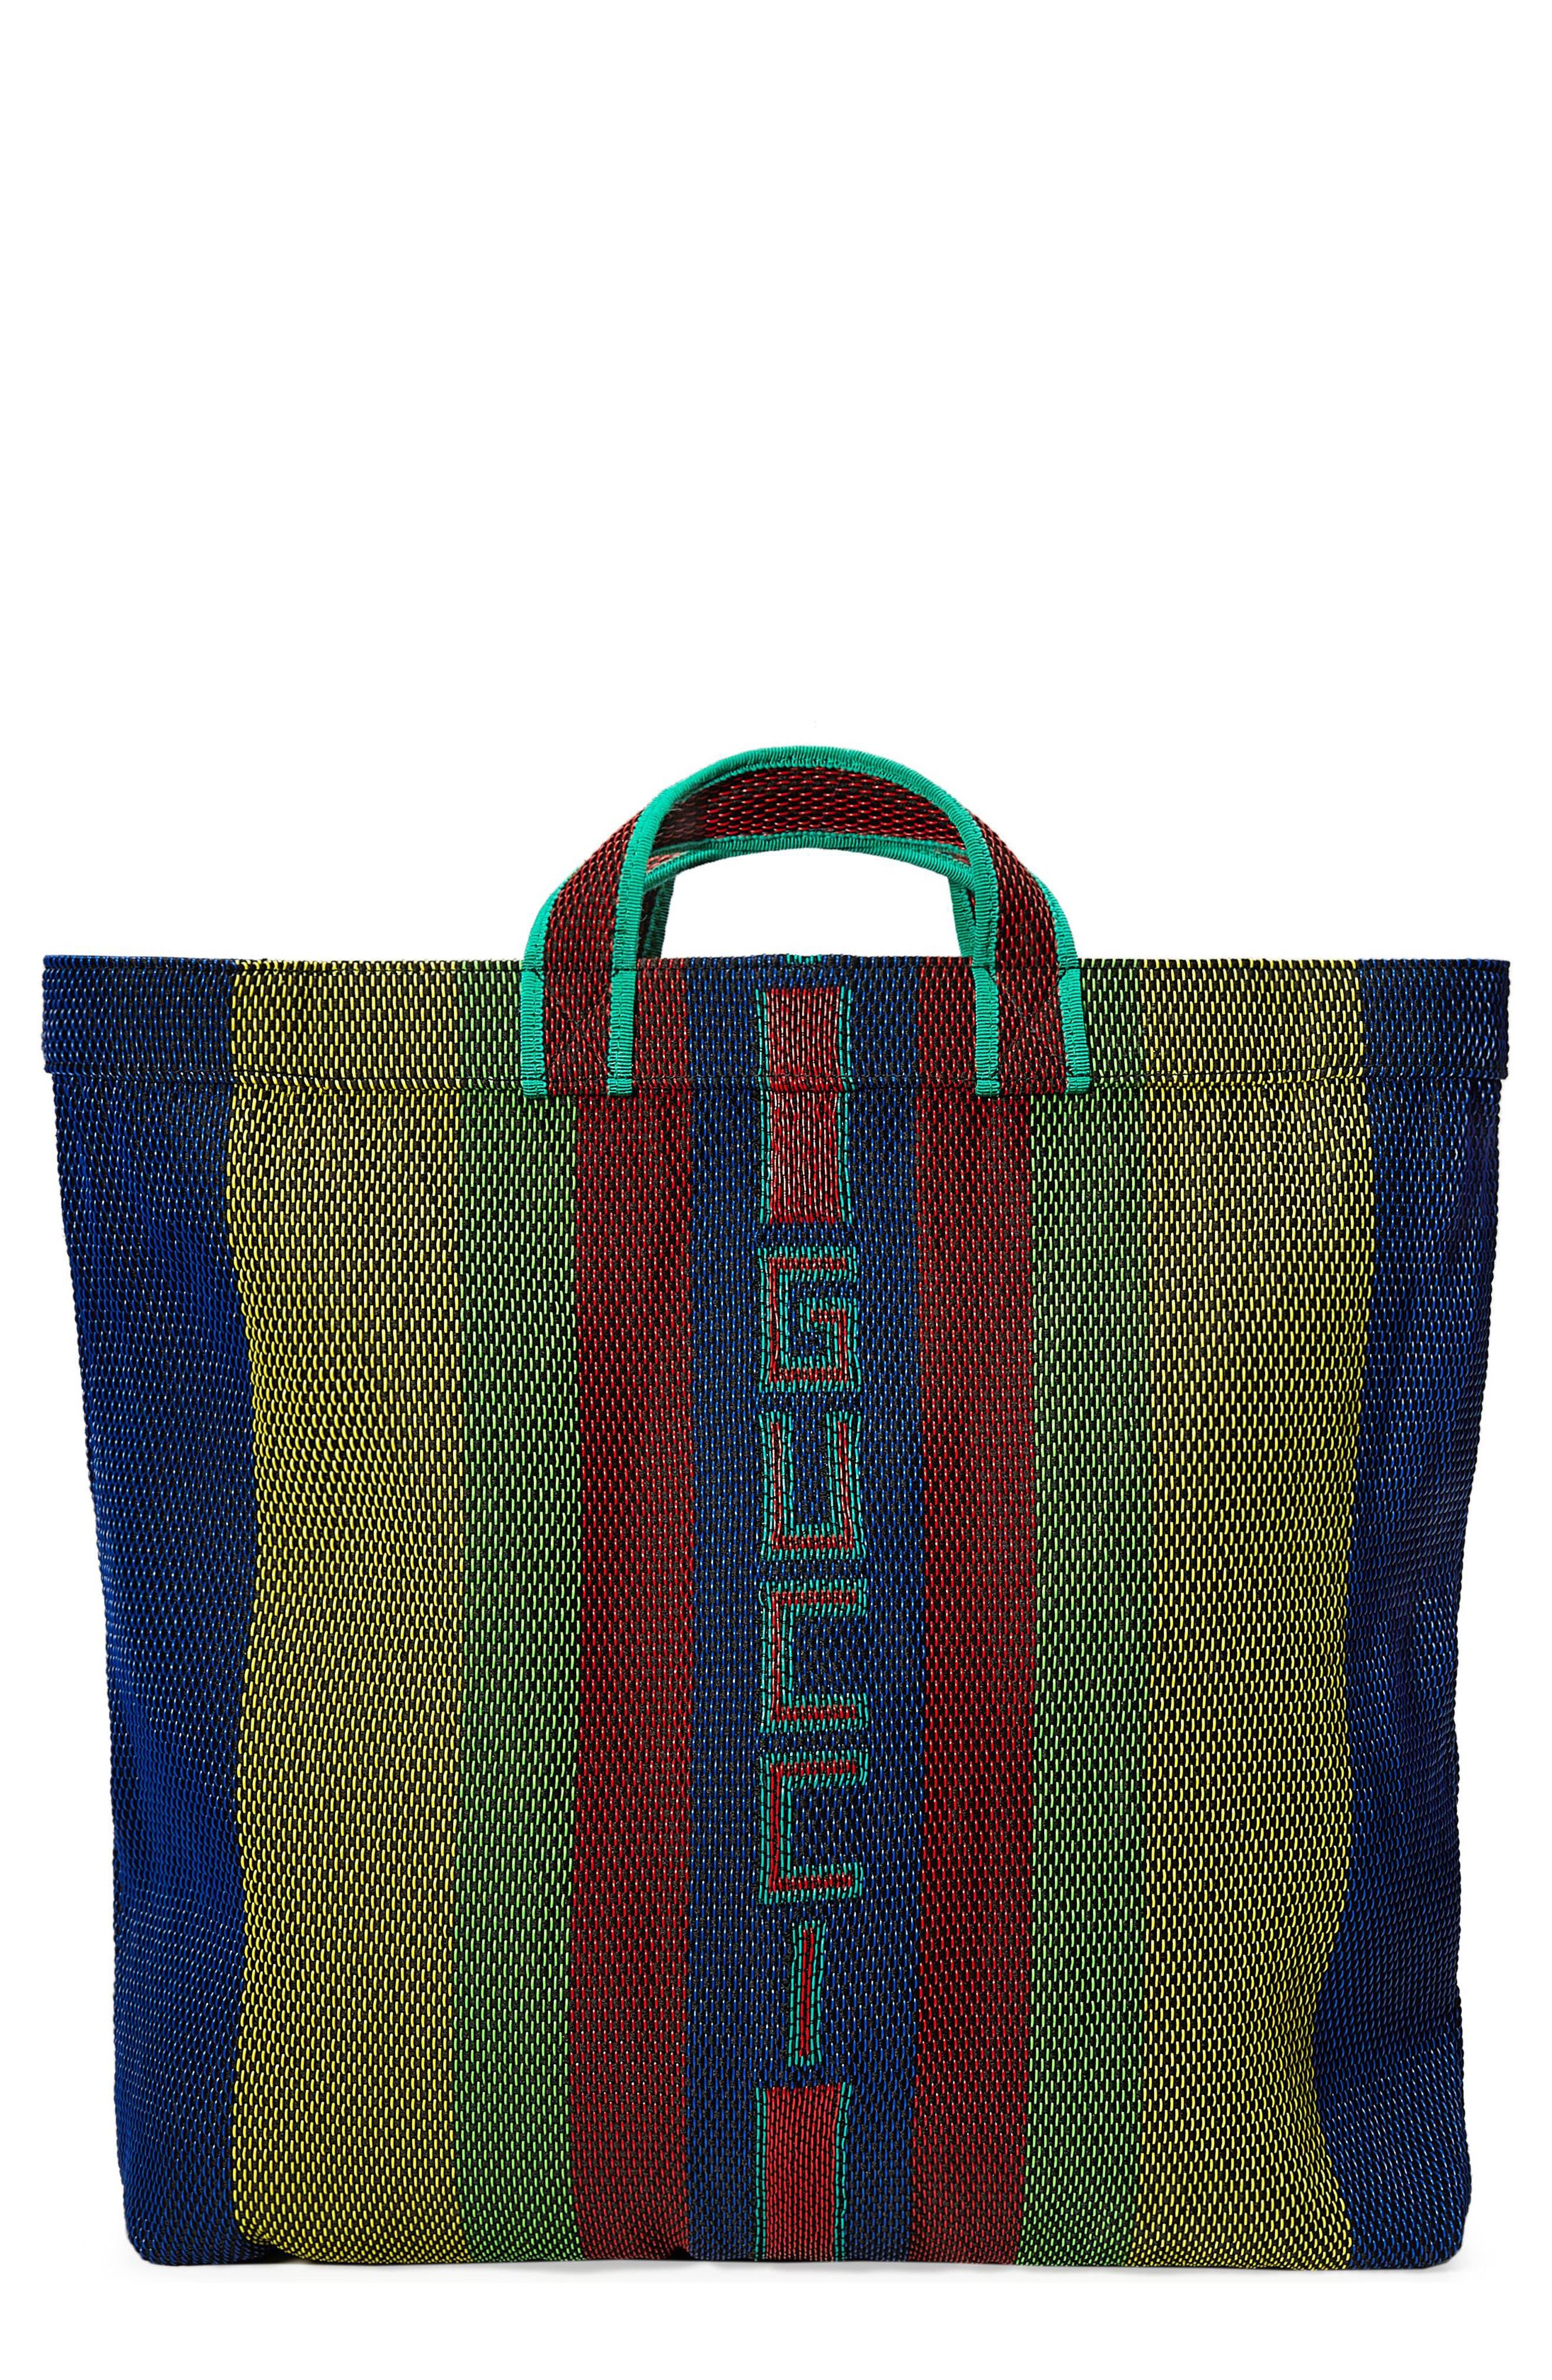 Alternate Image 1 Selected - Gucci Multicolor Tote